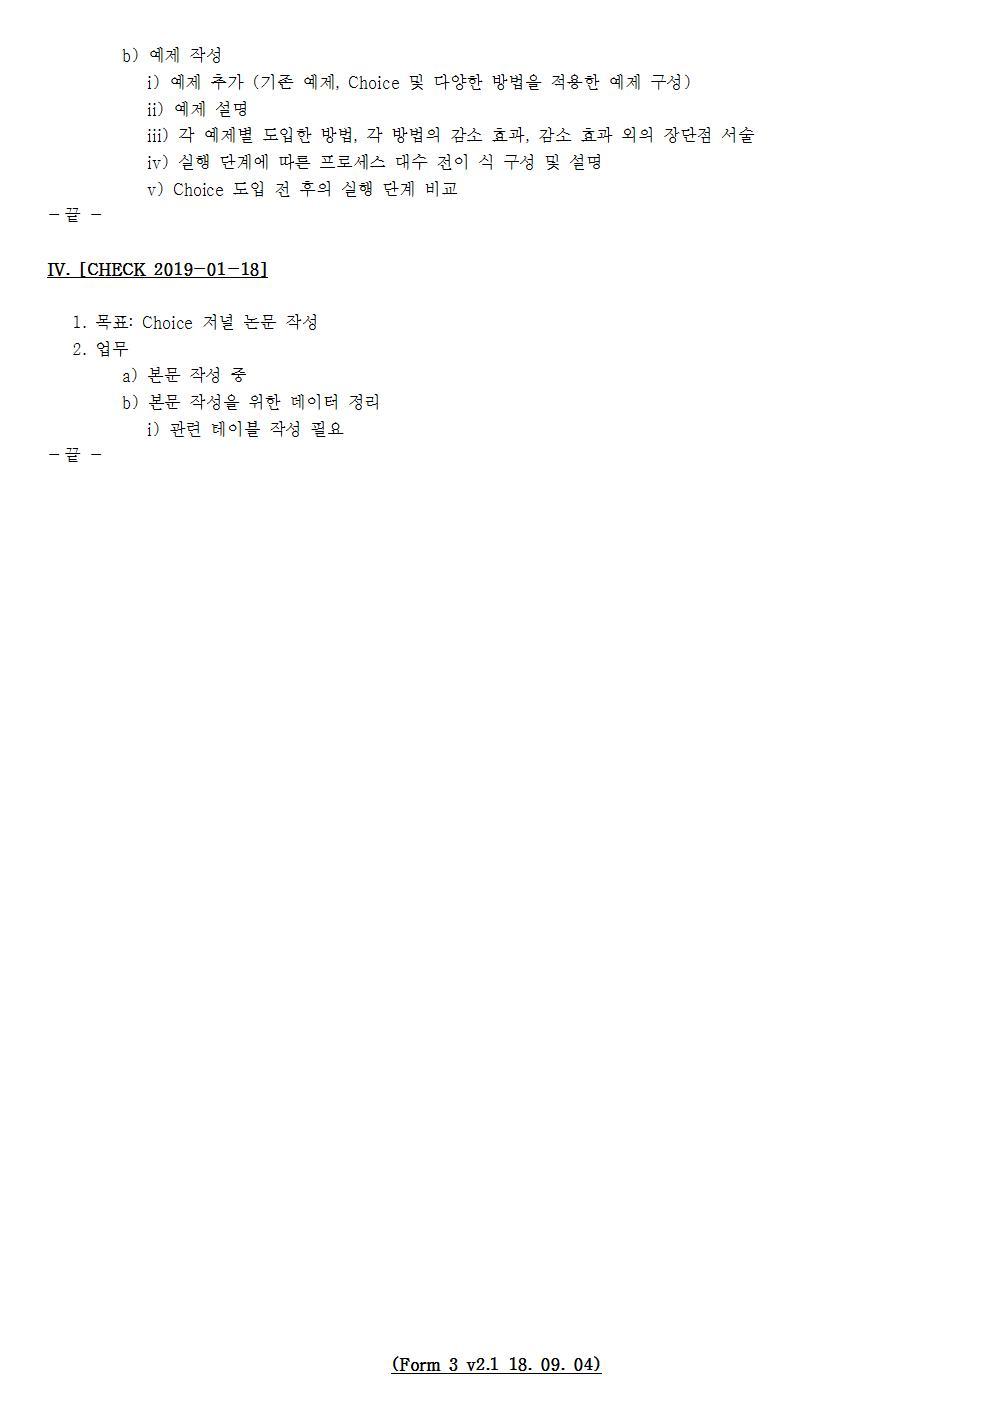 D-[19-011-PP-03]-[Choice Journal]-[2019-01-18][YB]002.jpg